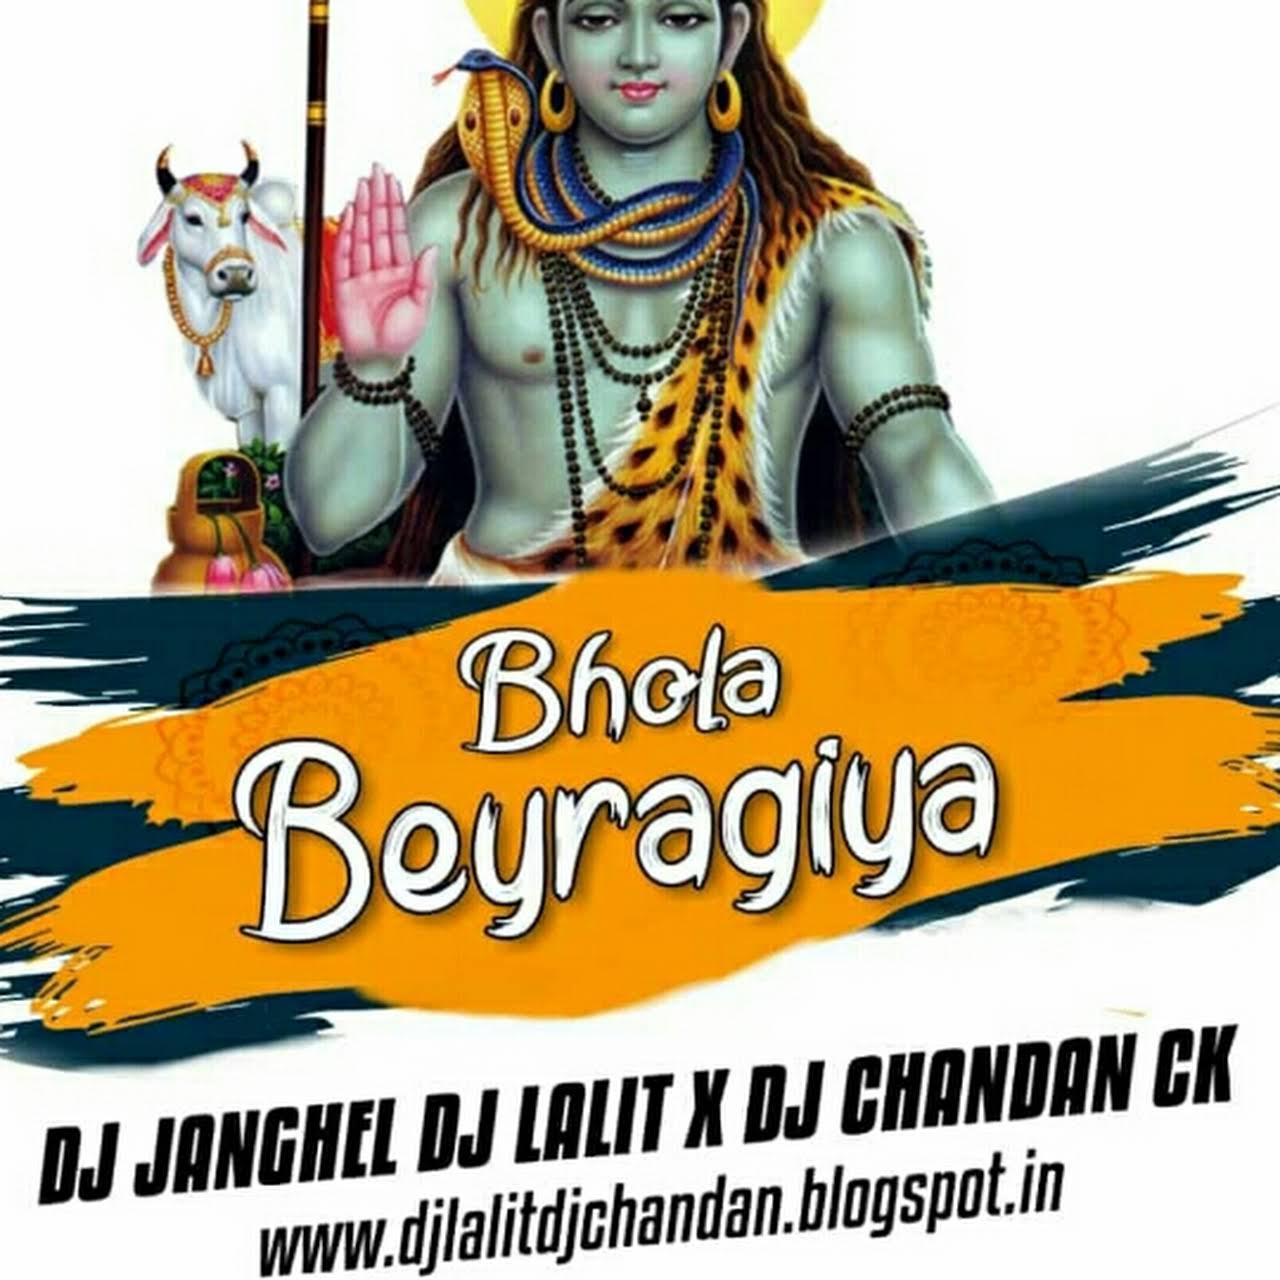 JANGHEL DJ & LIGHTS RAIPUR - DJ Service in RAIPUR CHHATTISGARH